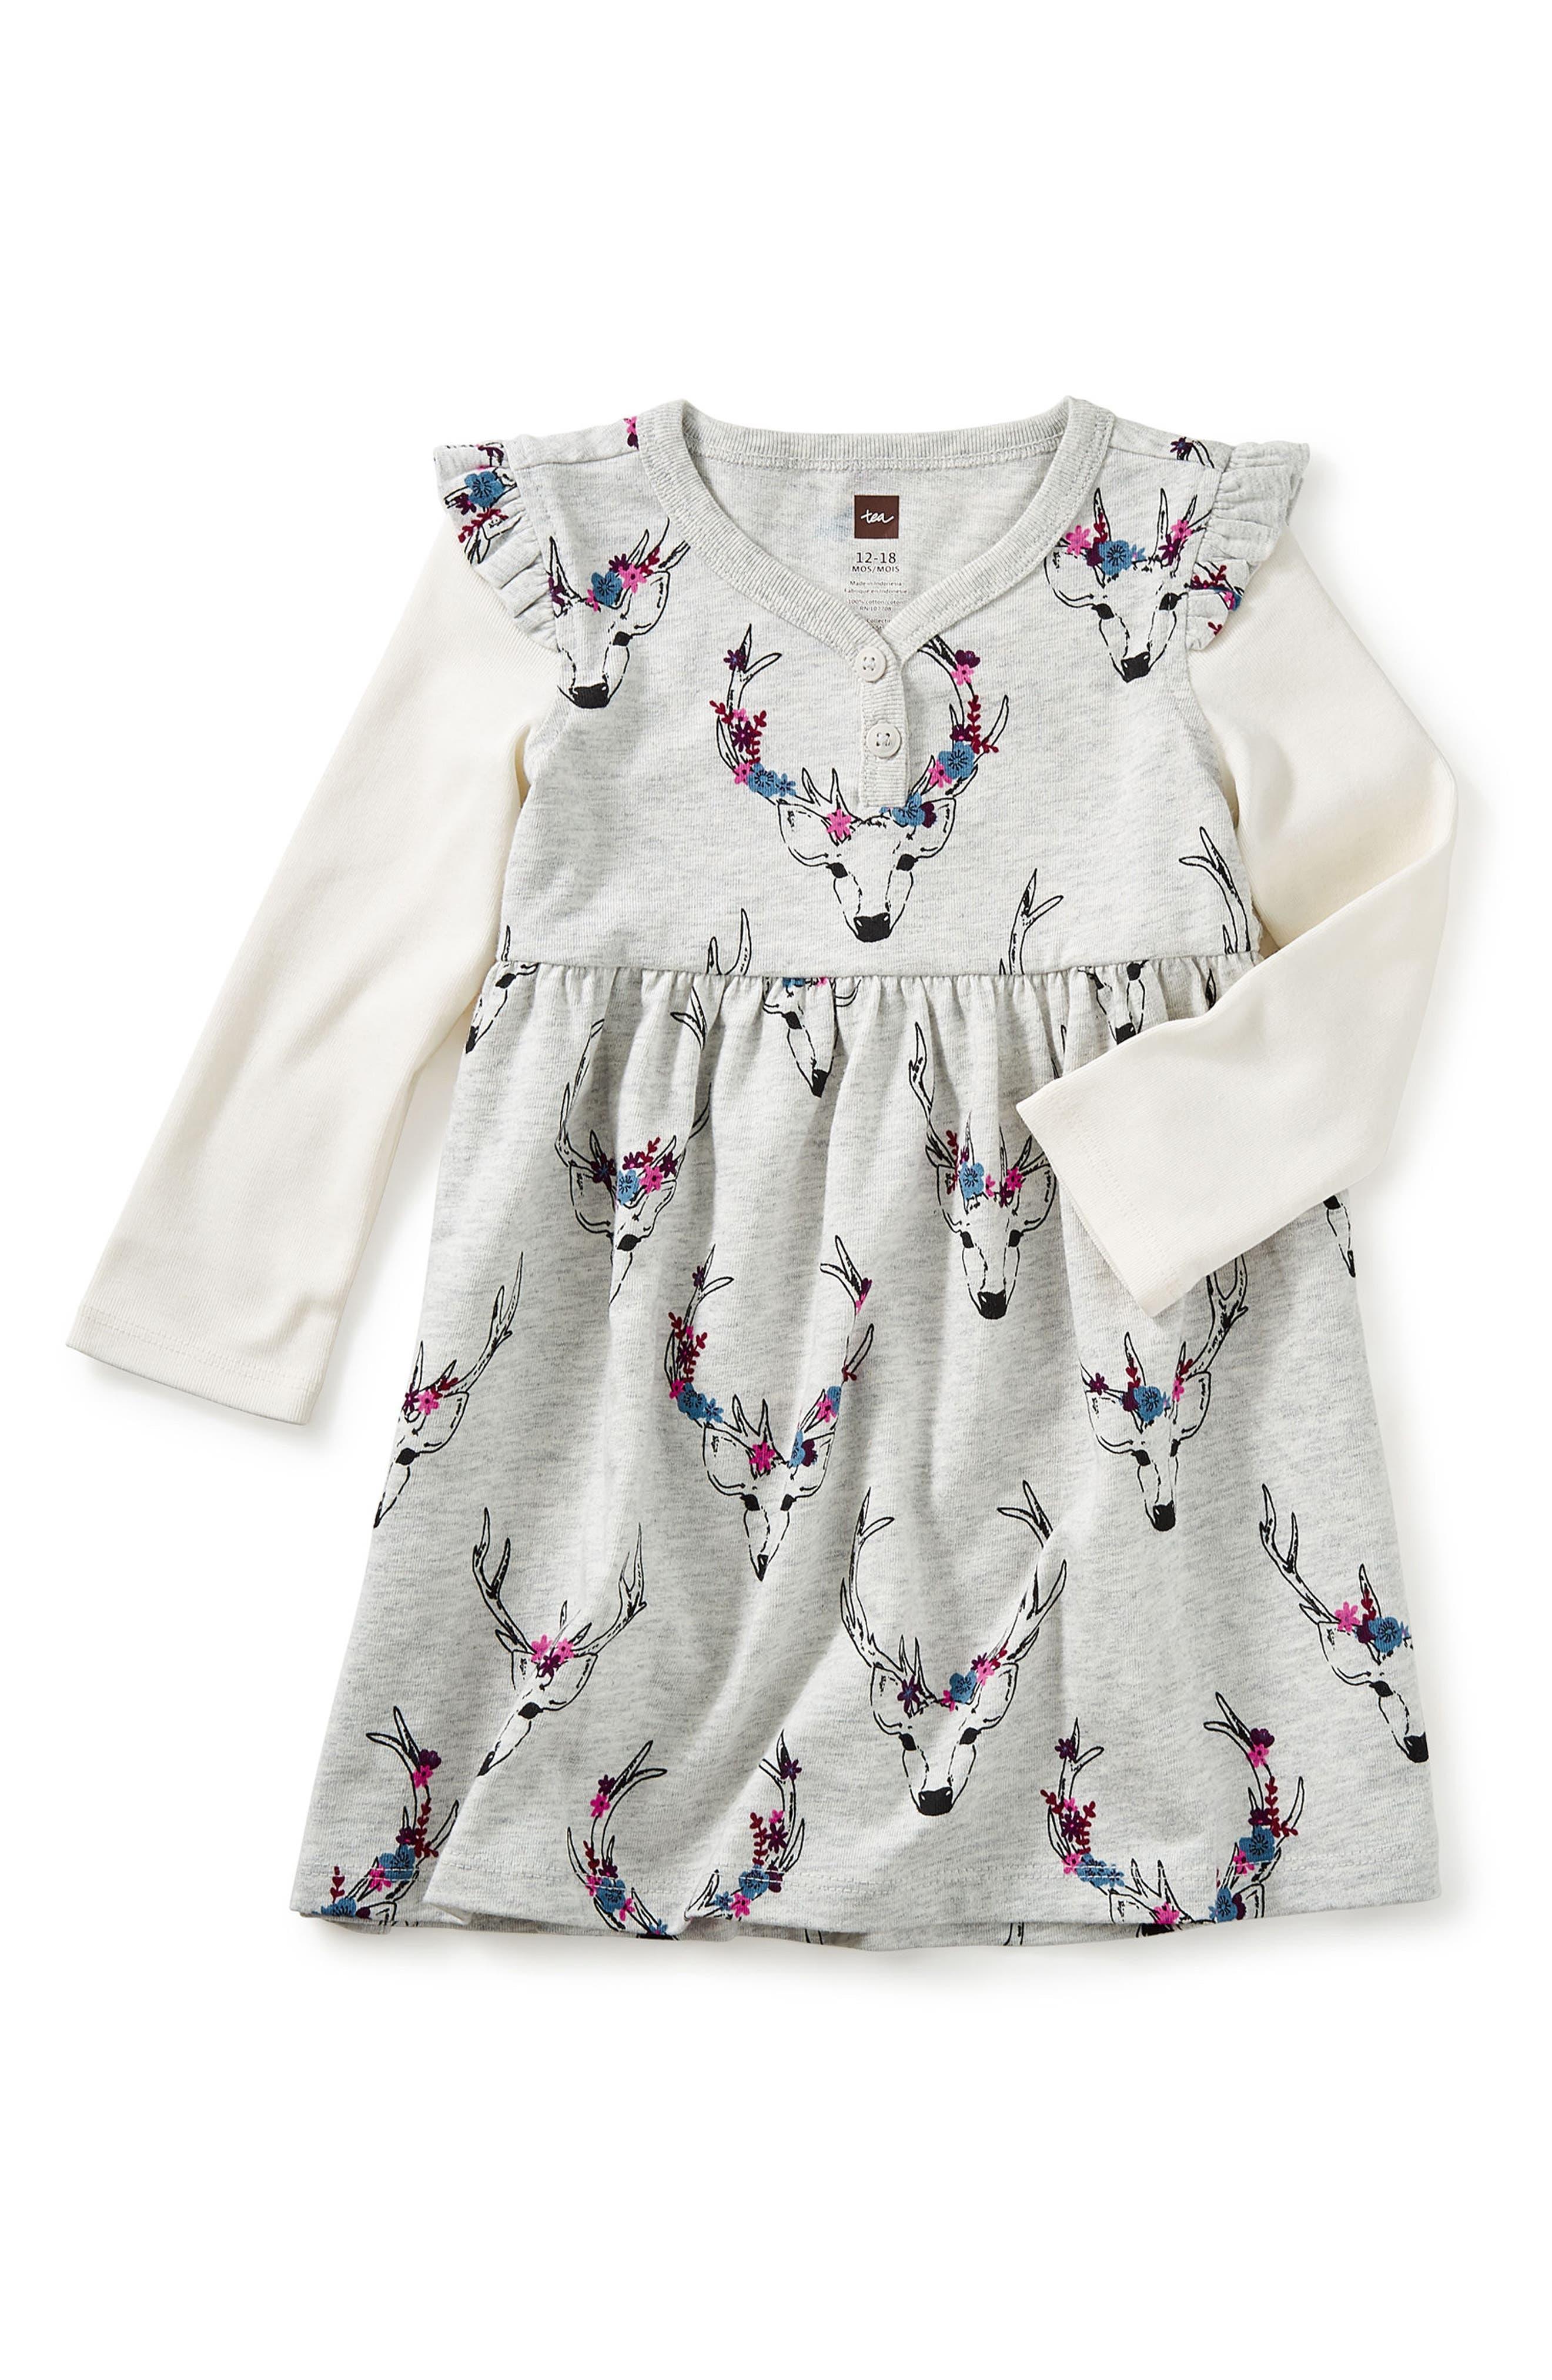 Oh Deer Layered Henley Dress,                             Main thumbnail 1, color,                             020